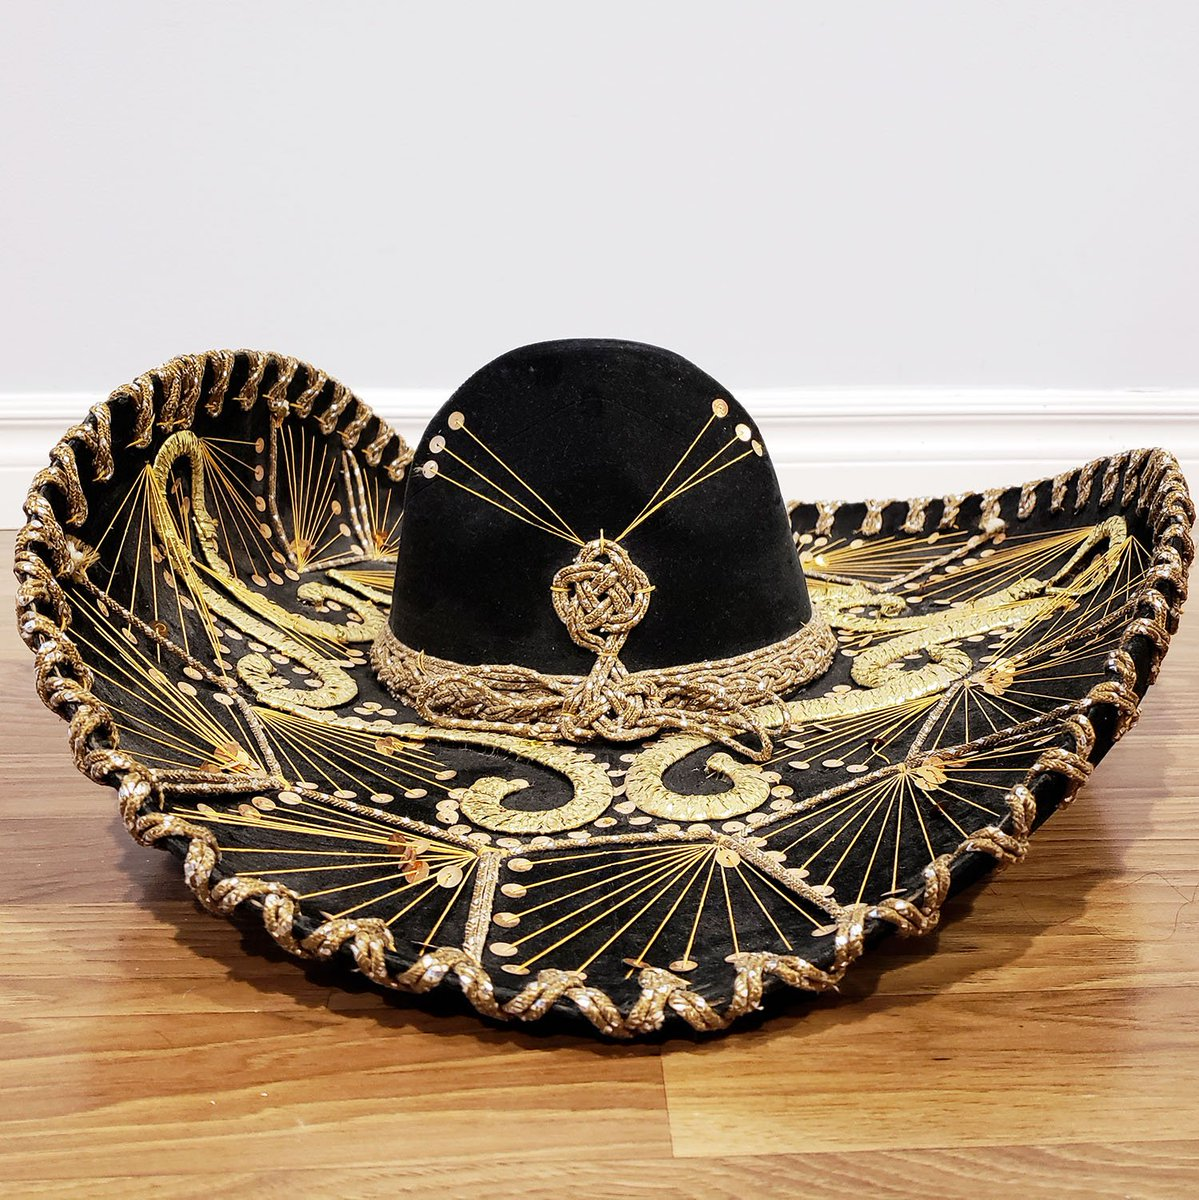 EtsySellsVtg  etsysellsvintage  etsyvintageteam  vintagelife  vintage   shopsmall  shoplocal  shopetsy  etsyshop  shoponline  YVR  sombrero   mexico ... eb927954ef4